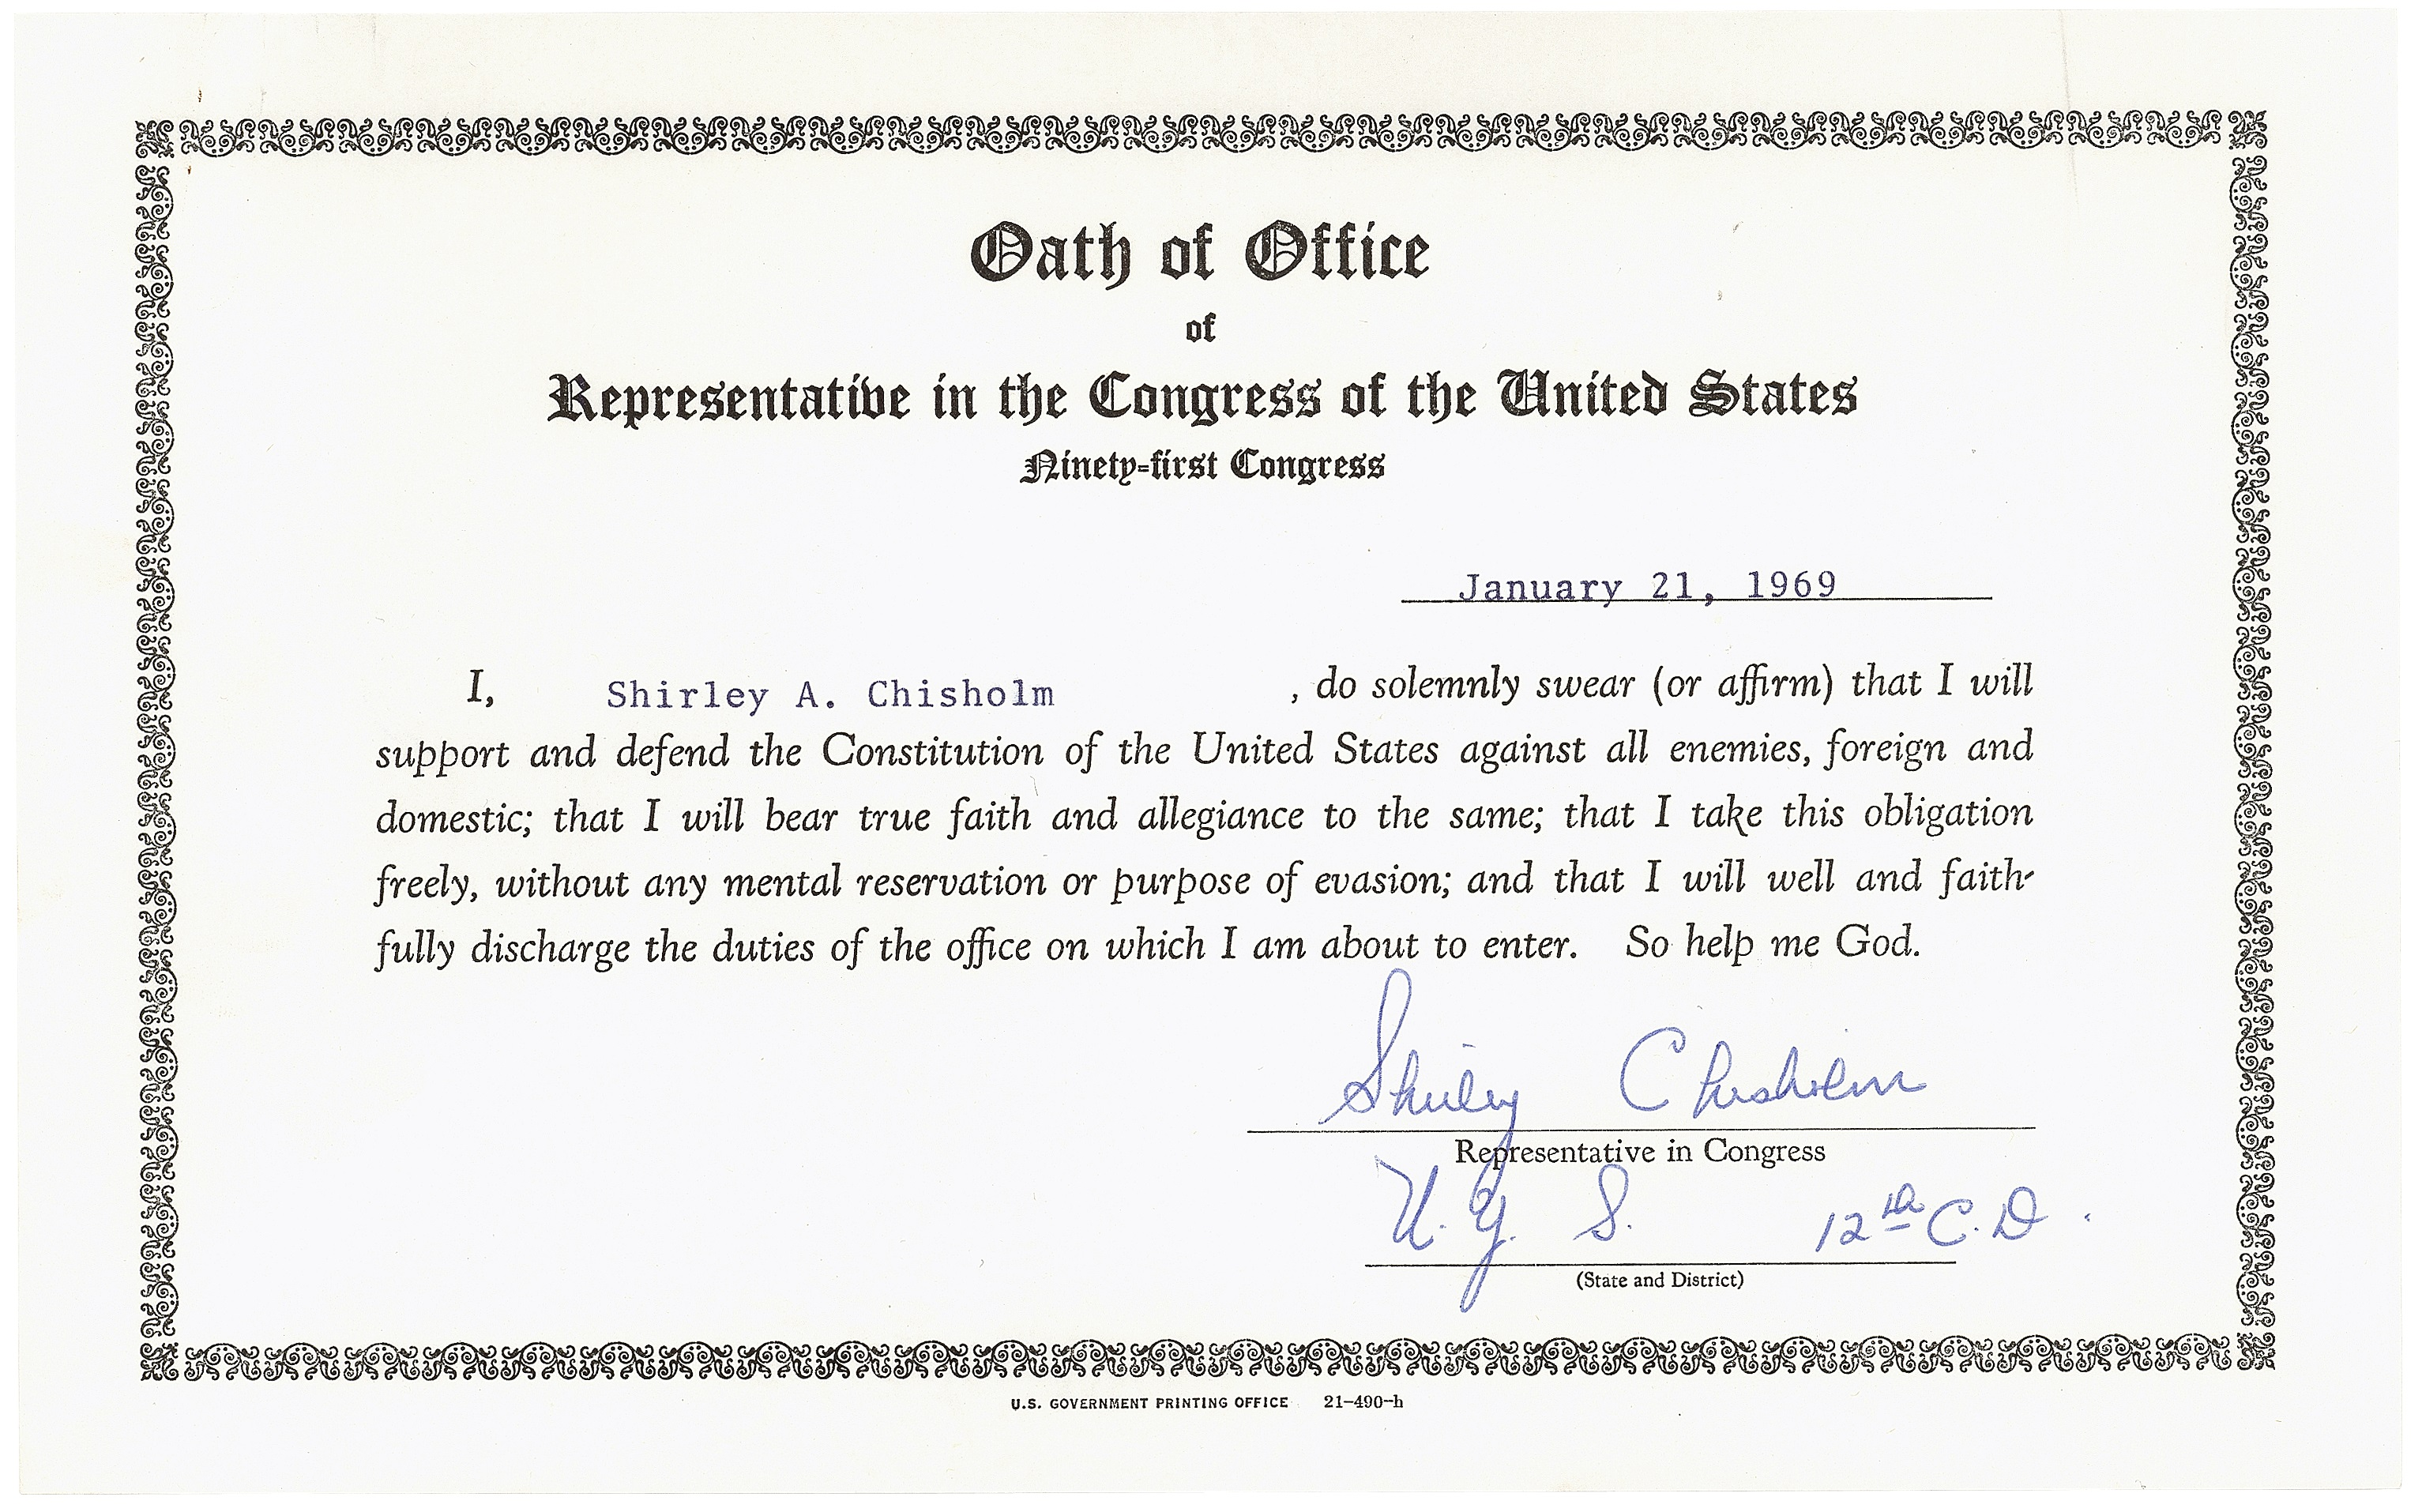 Shirley_Chisholm_Oath_of_Office_Jan_29_1961